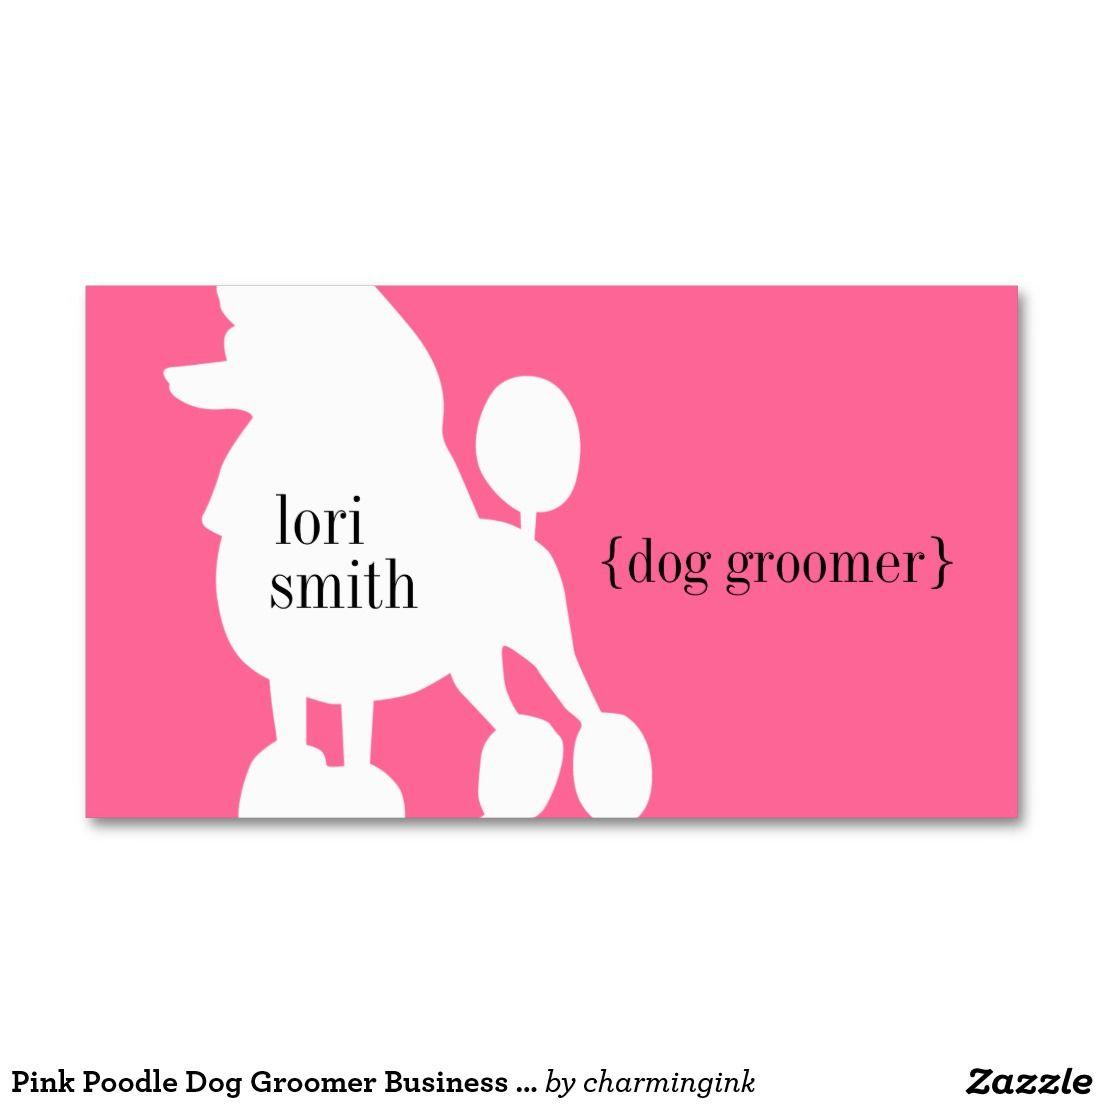 Pink Poodle Dog Groomer Business Card | Pink poodle, Poodle and ...